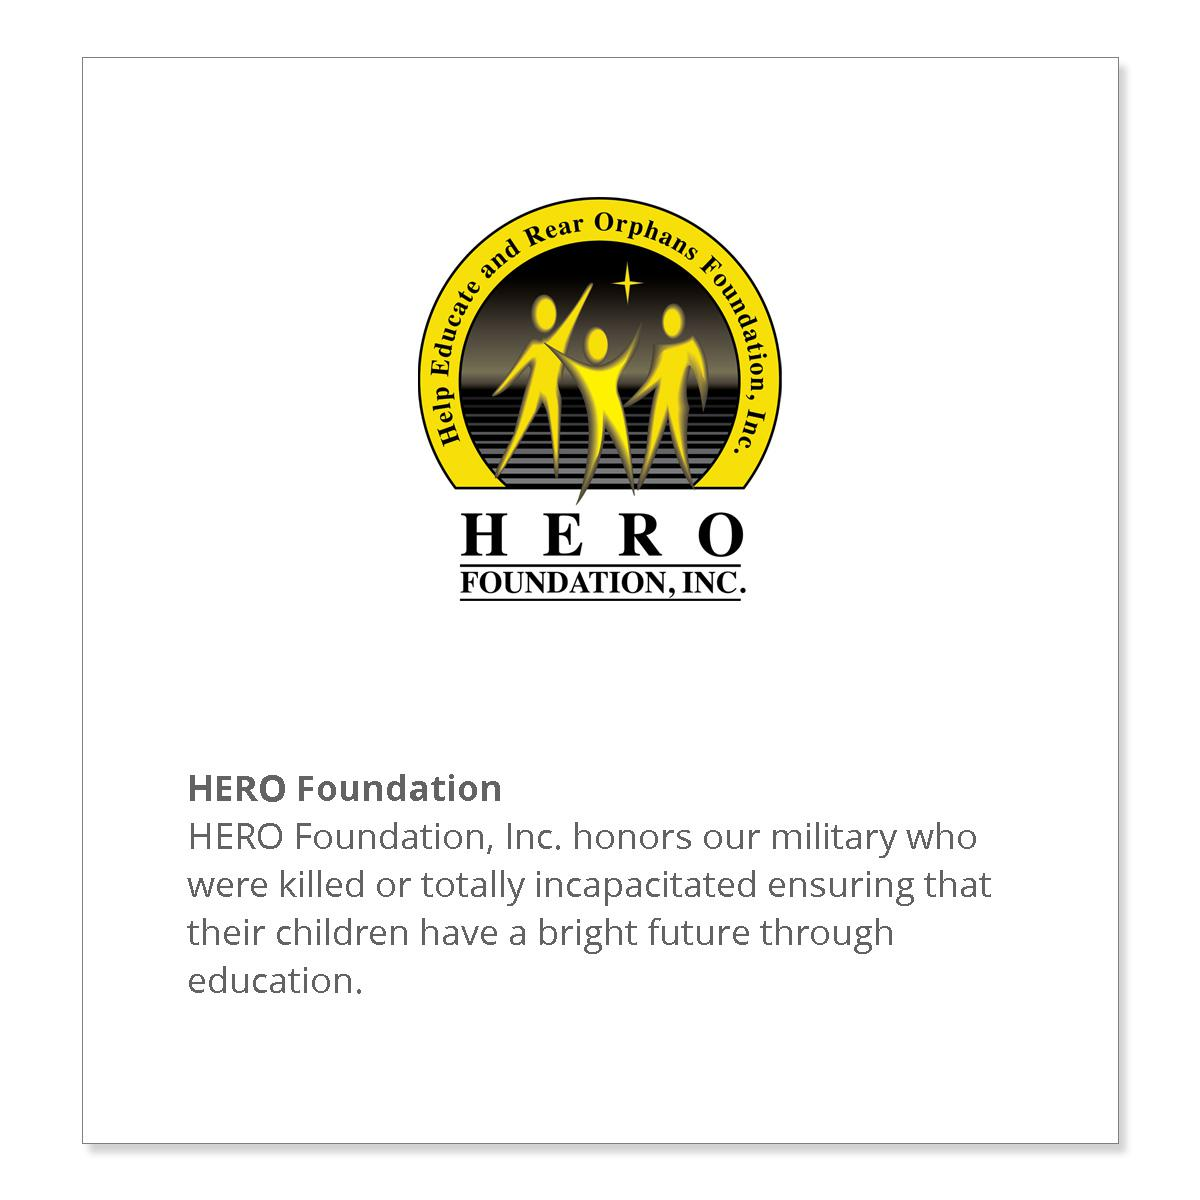 HERO Foundation